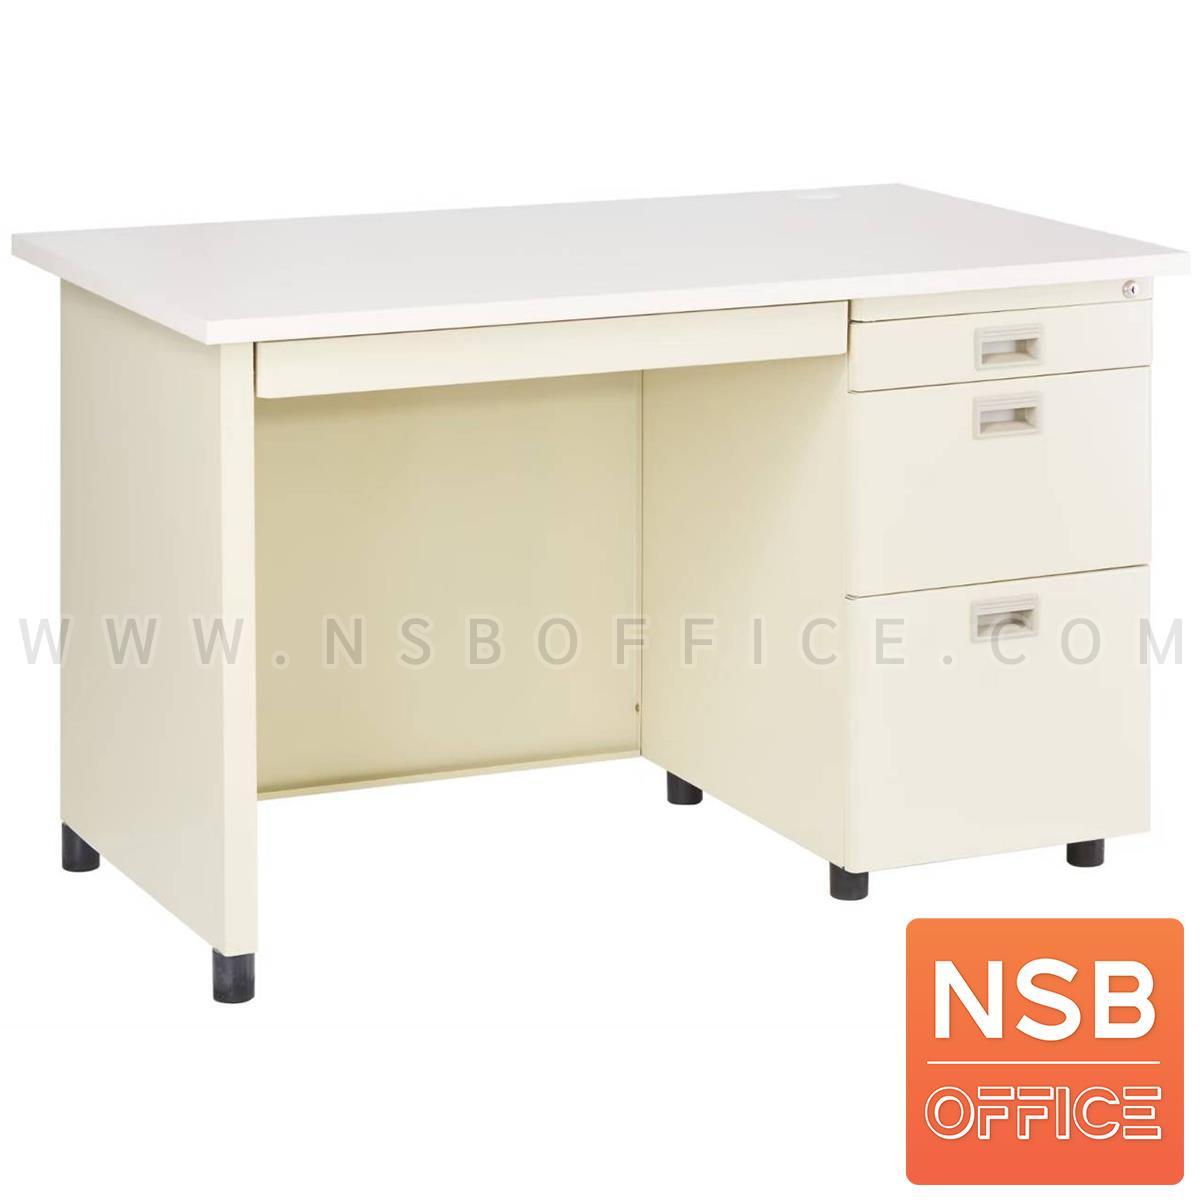 E06A017:โต๊ะทำงานเหล็กหน้าไม้ผิวพีวีซี 4 ลิ้นชัก  รุ่น DNP127 ขนาด 120W*70D cm.  เหล็กหนาพิเศษ 0.6 มม.